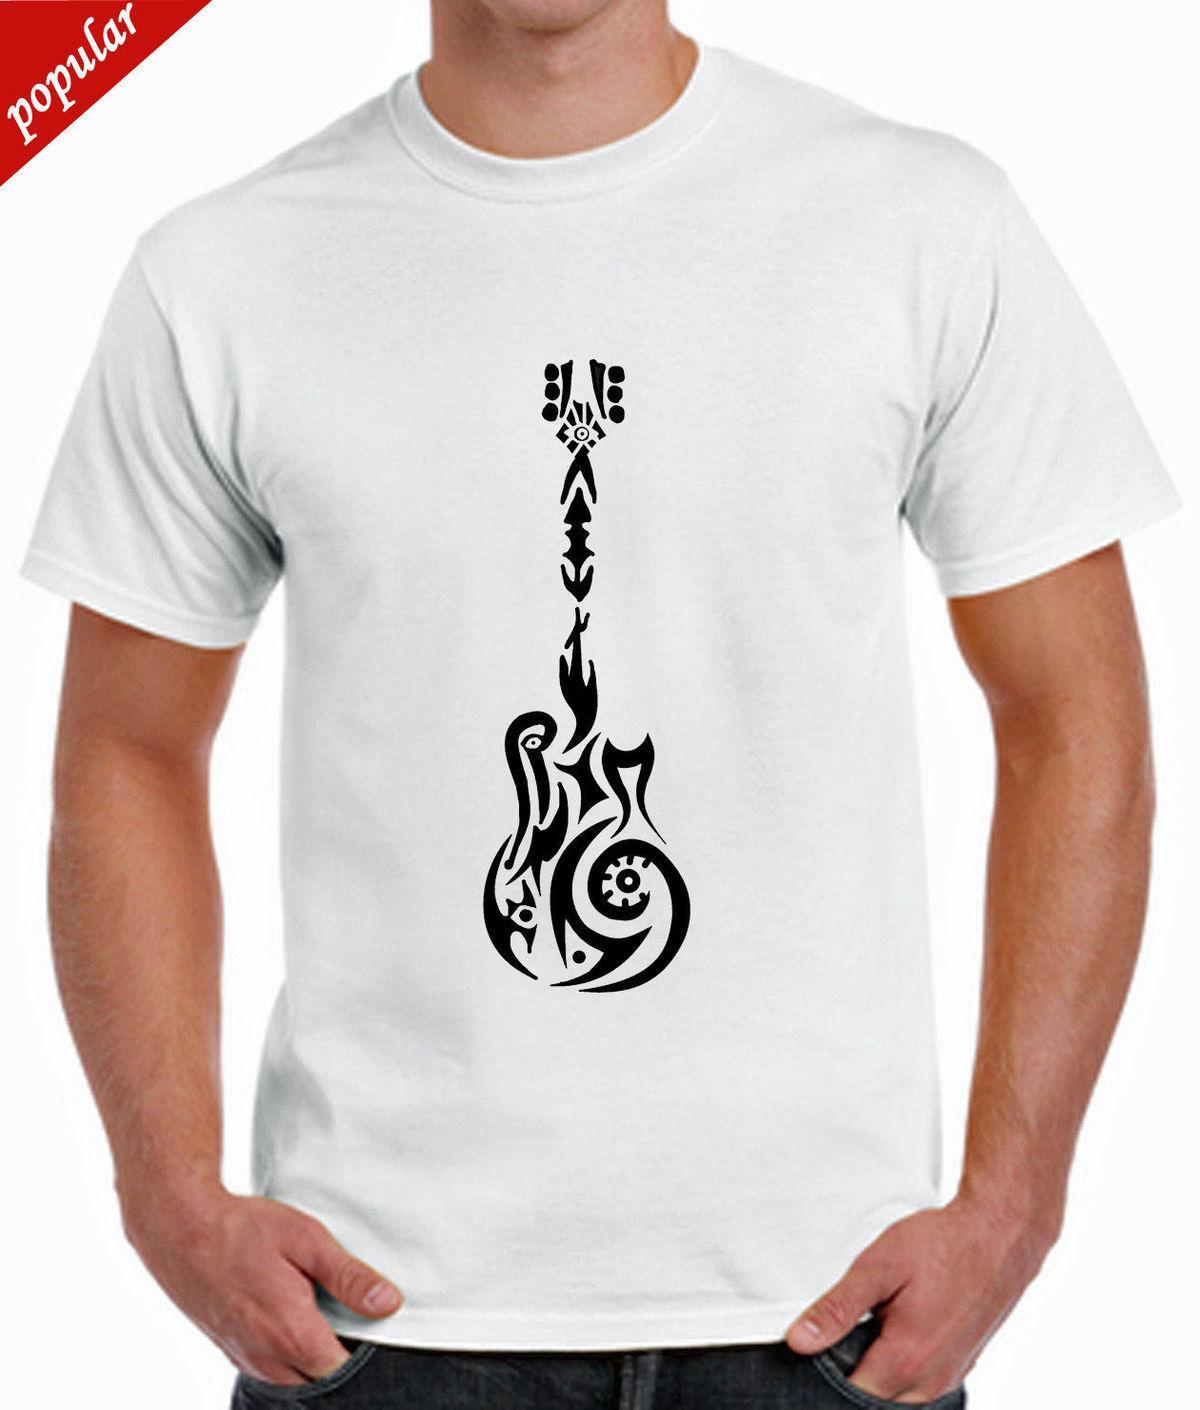 3bb3bfb2fdaf4 Compre Guitarra Guitarra Camiseta Moda Azteca Música Eléctrica Ropa Rock  Cool Barato A  11.0 Del Customteemall